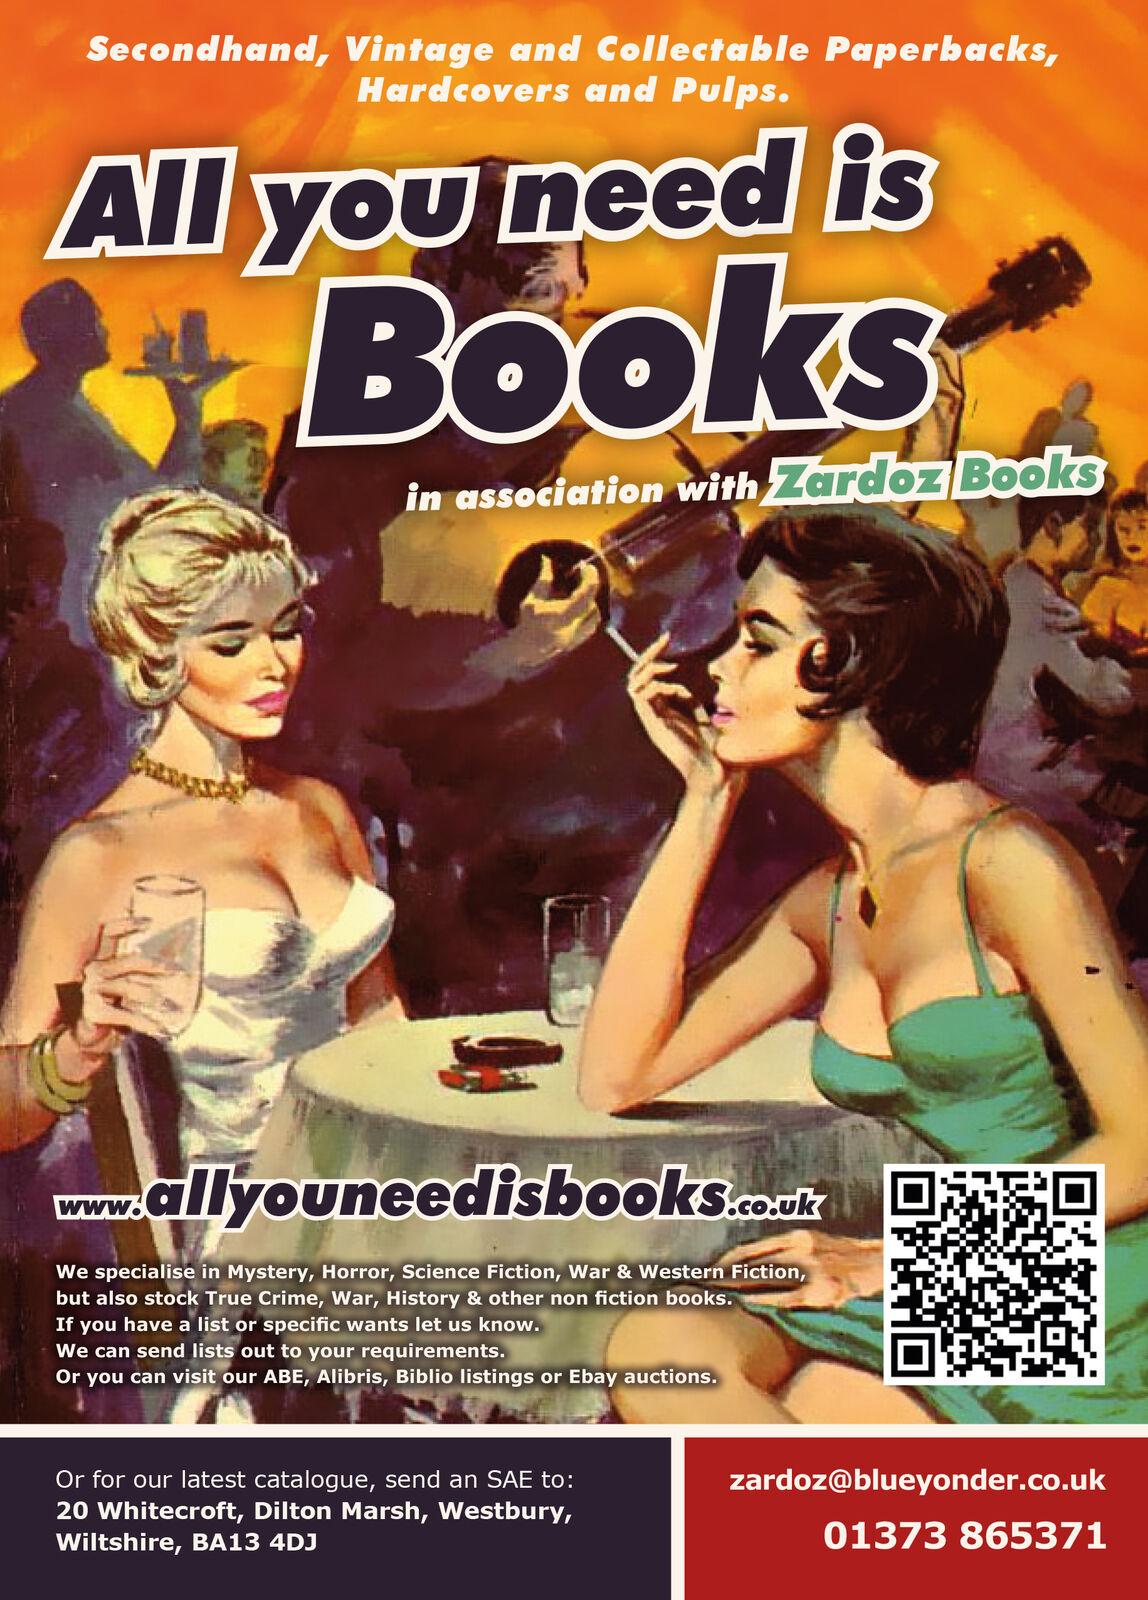 zardozbooks / Allyouneedisbooks Ltd